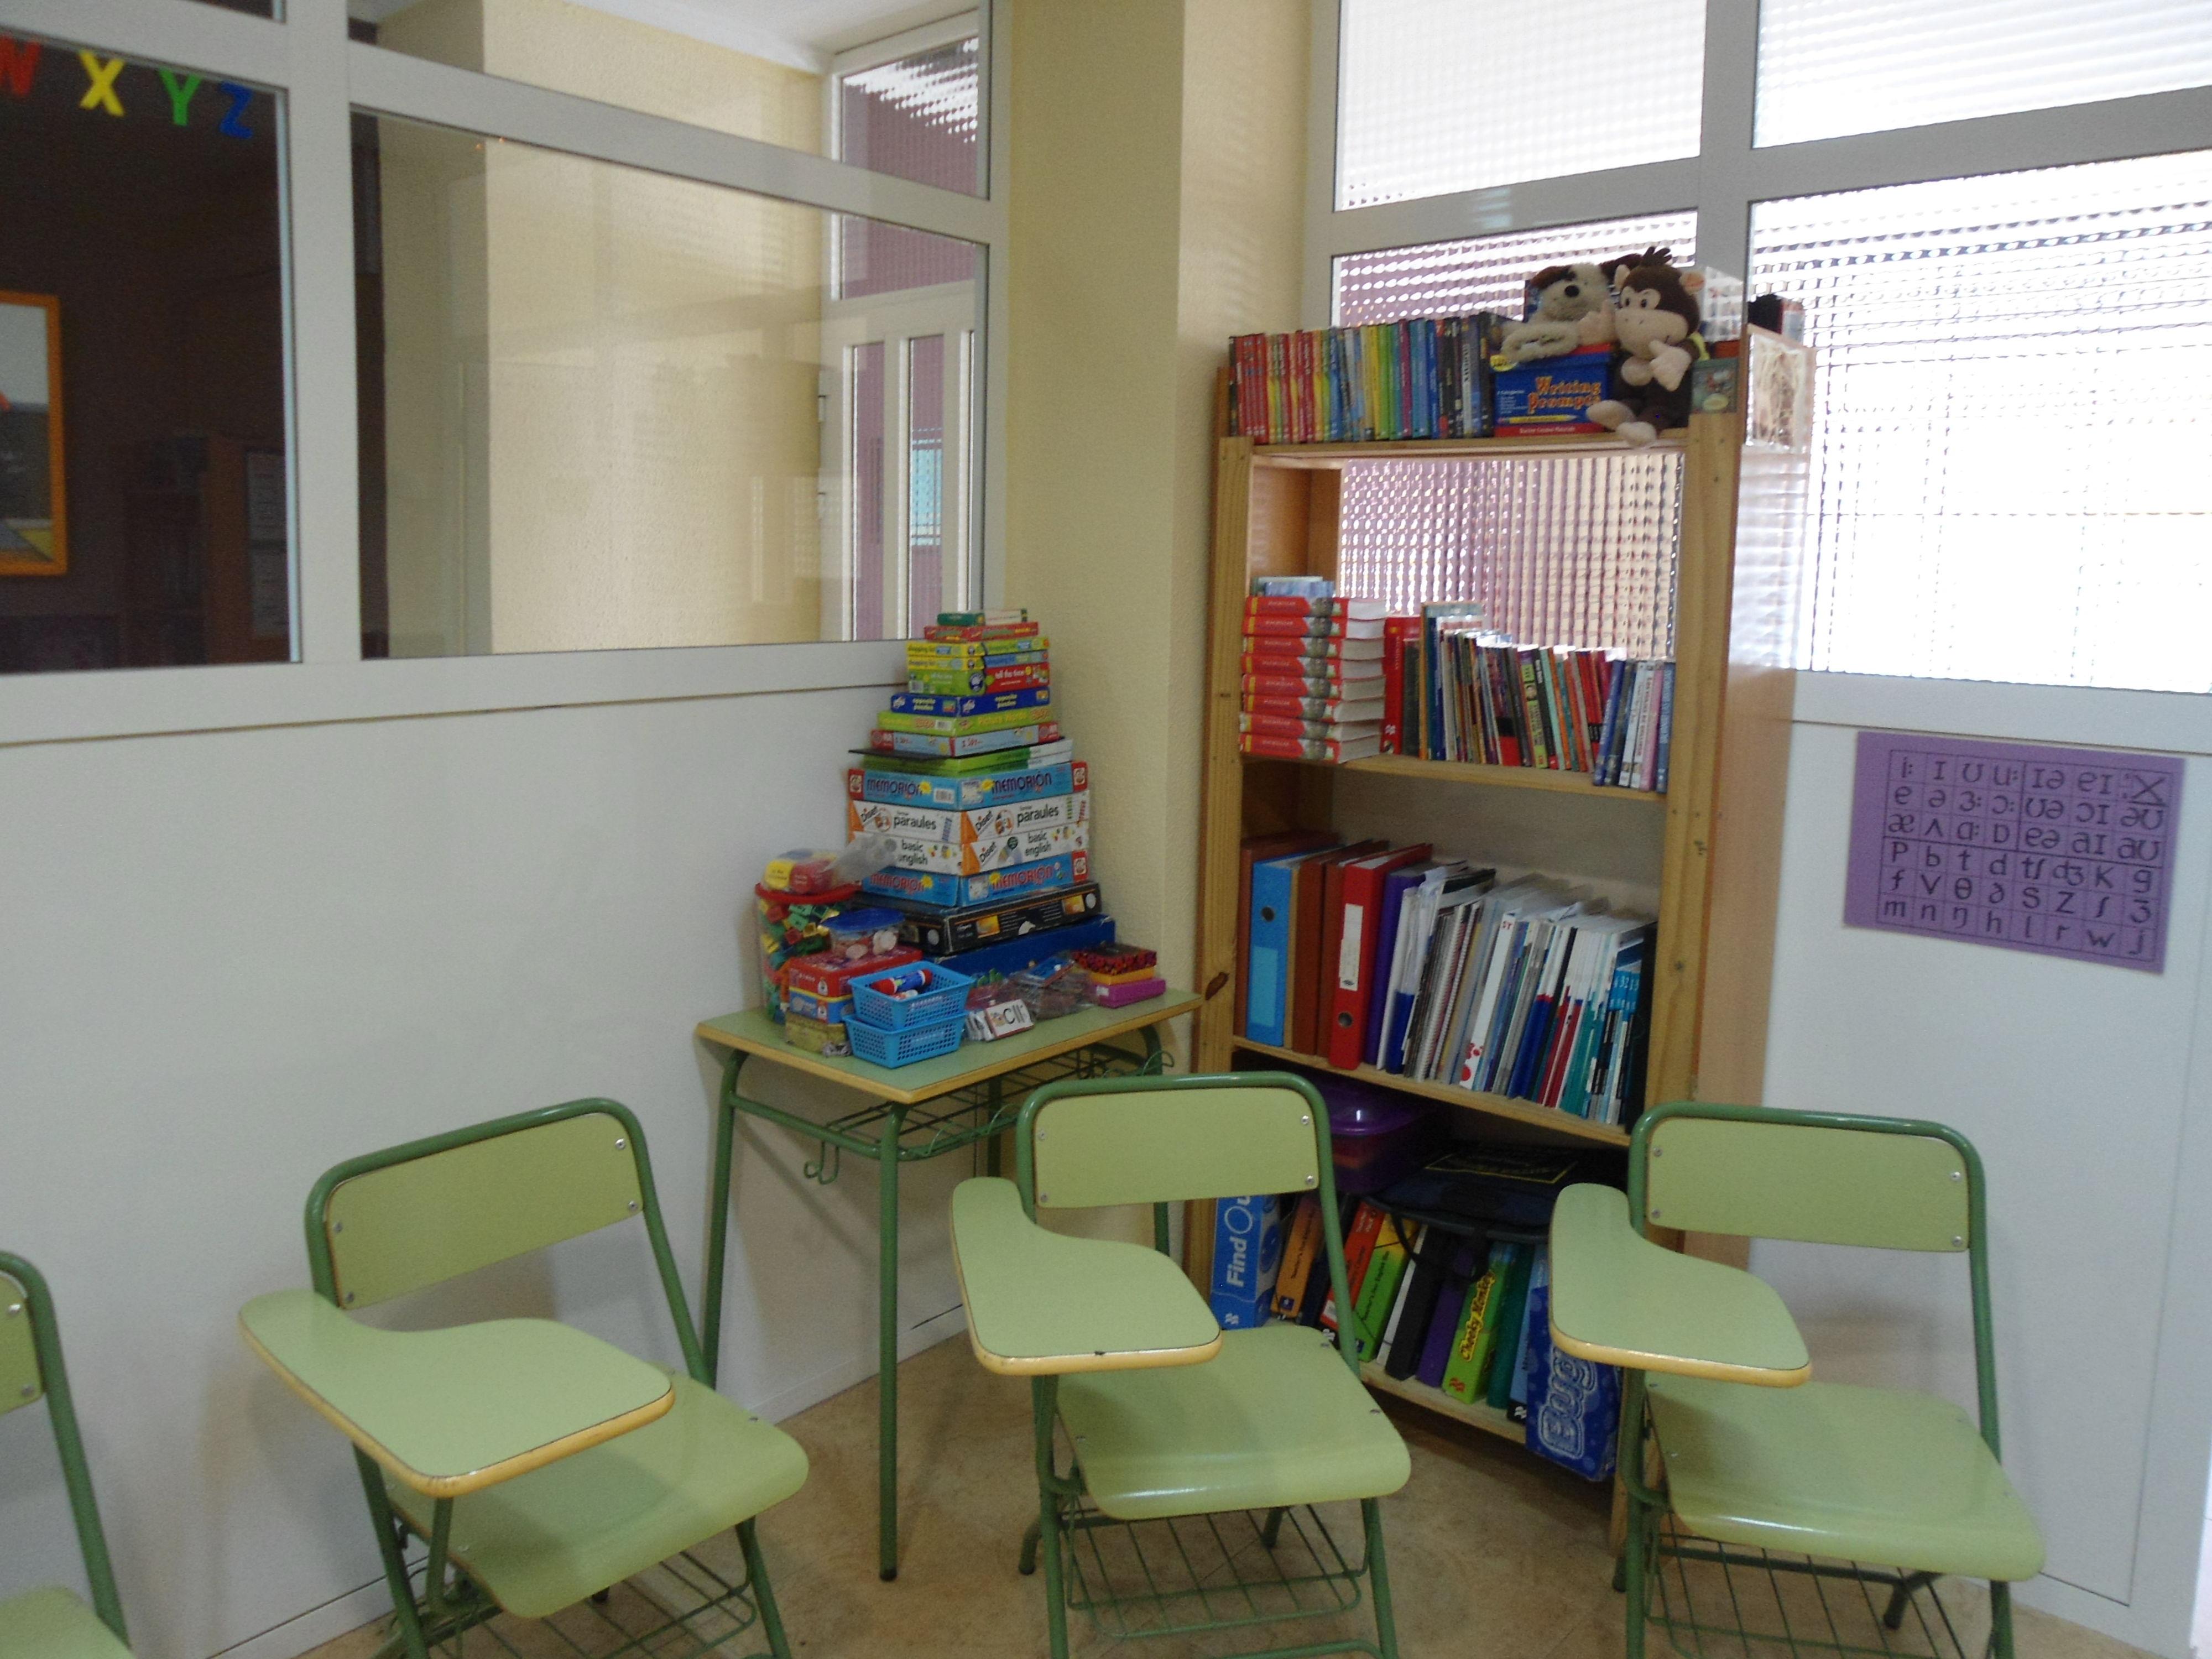 Foto 18 de Academias de idiomas en Moncada | Centre d'Estudis Etnies